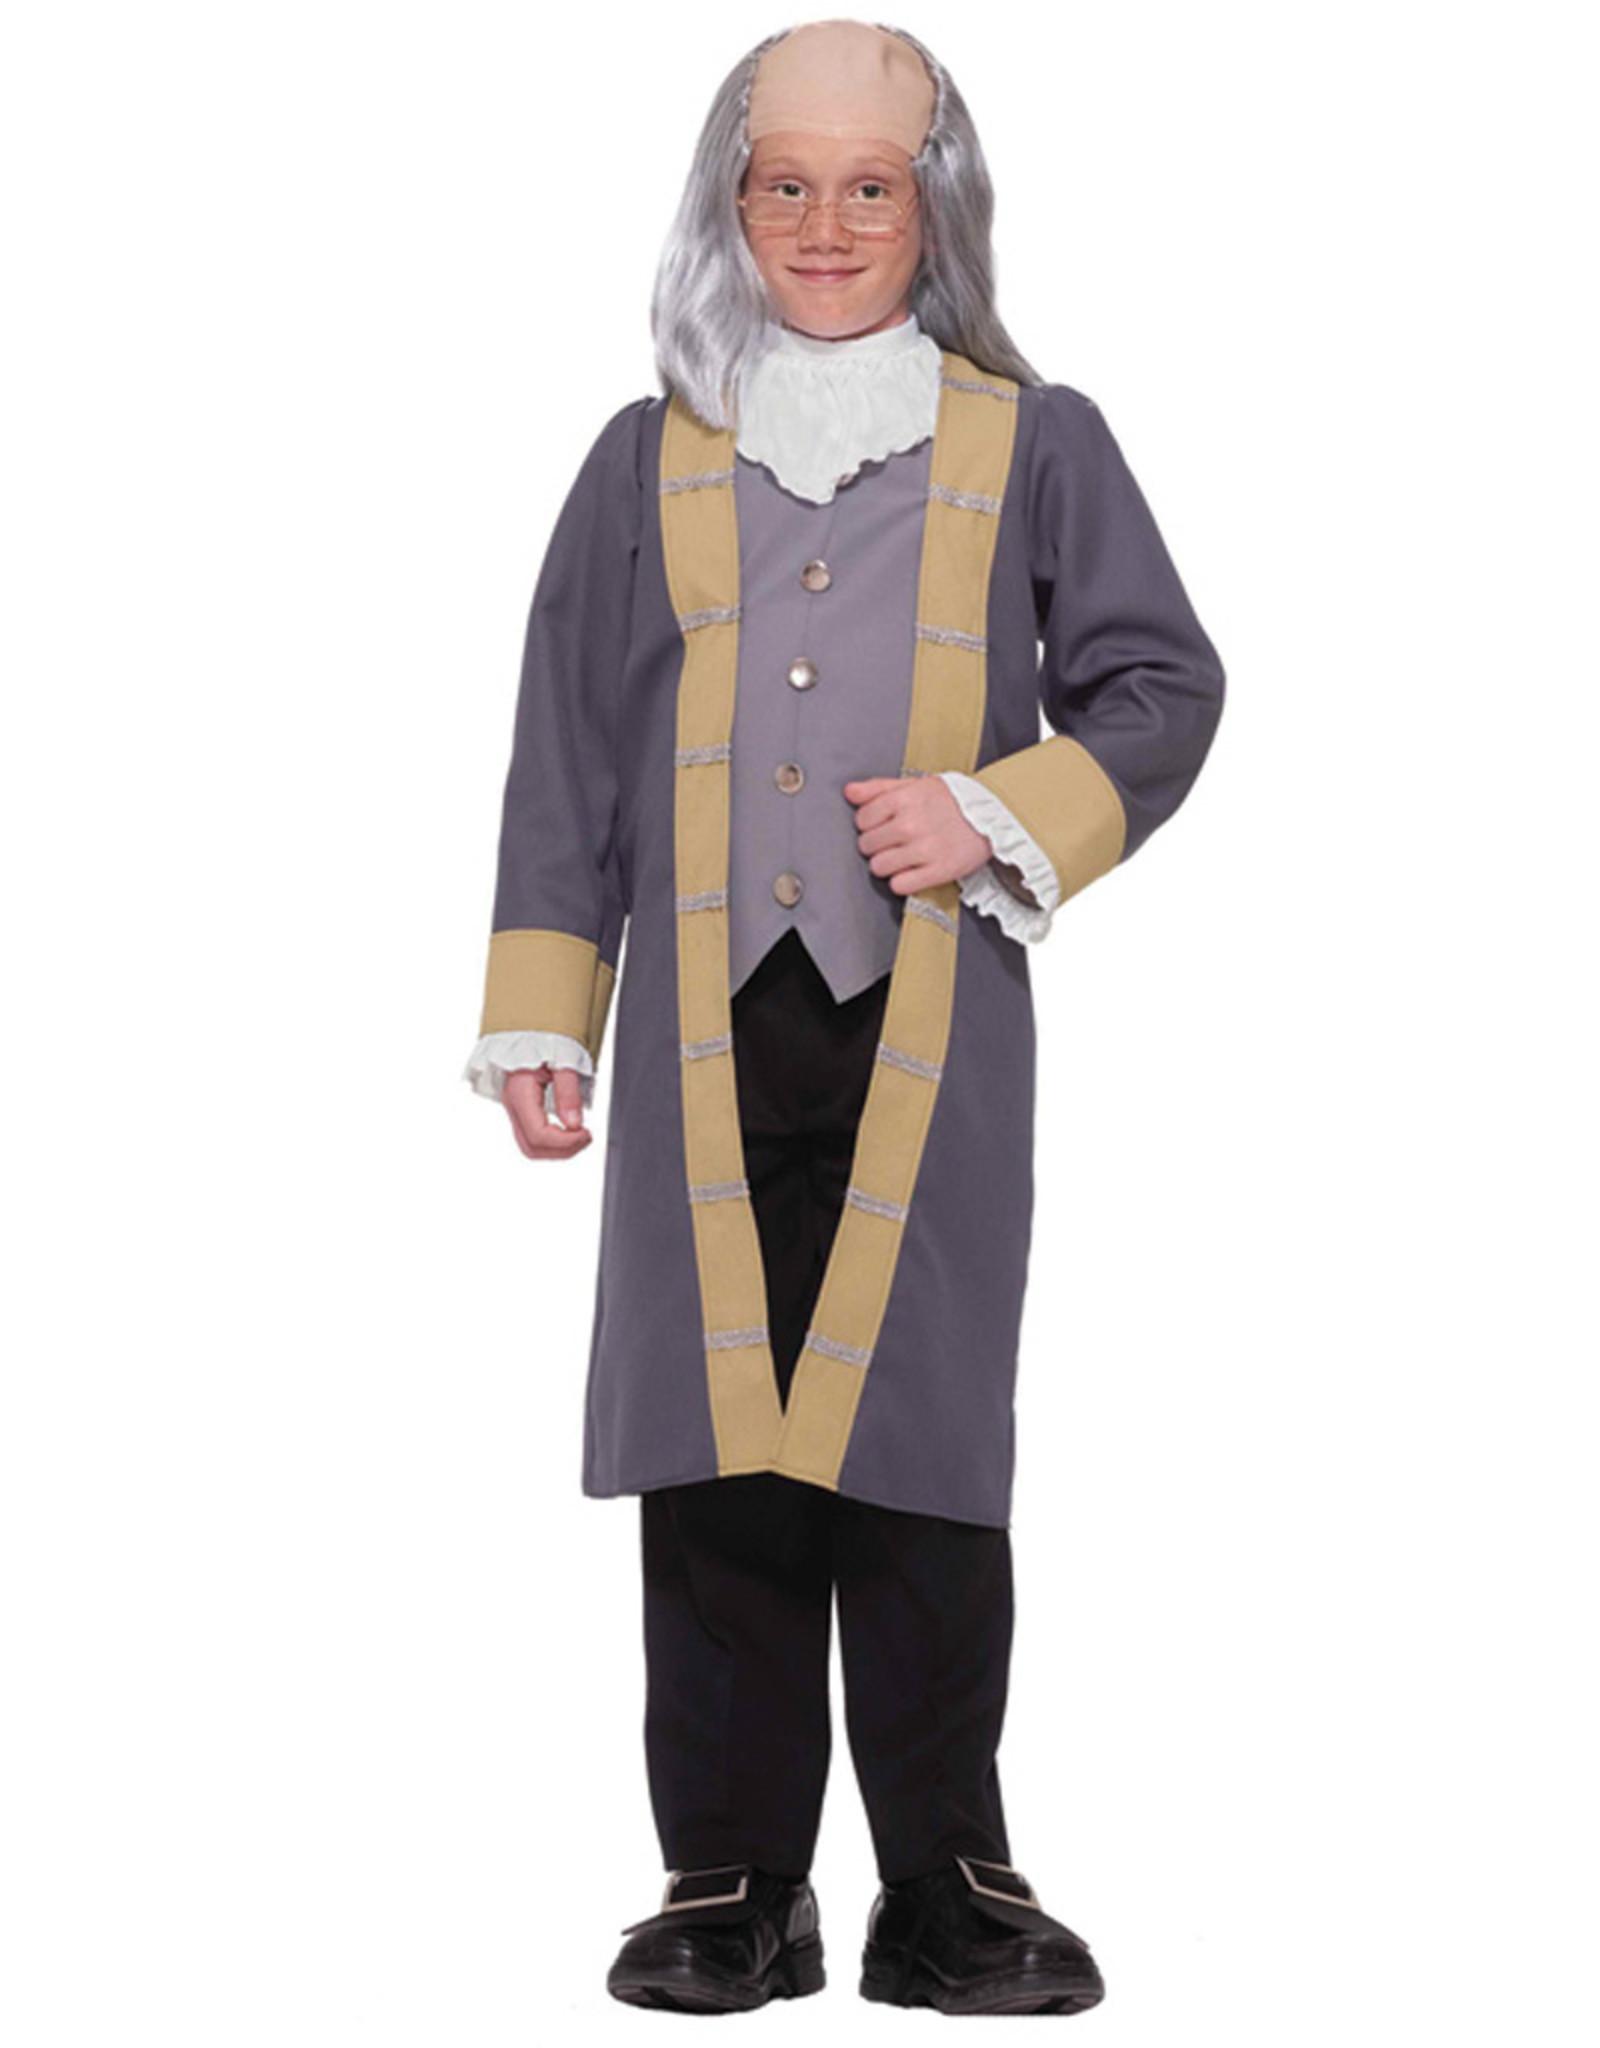 Ben Franklin Costume - Boy's